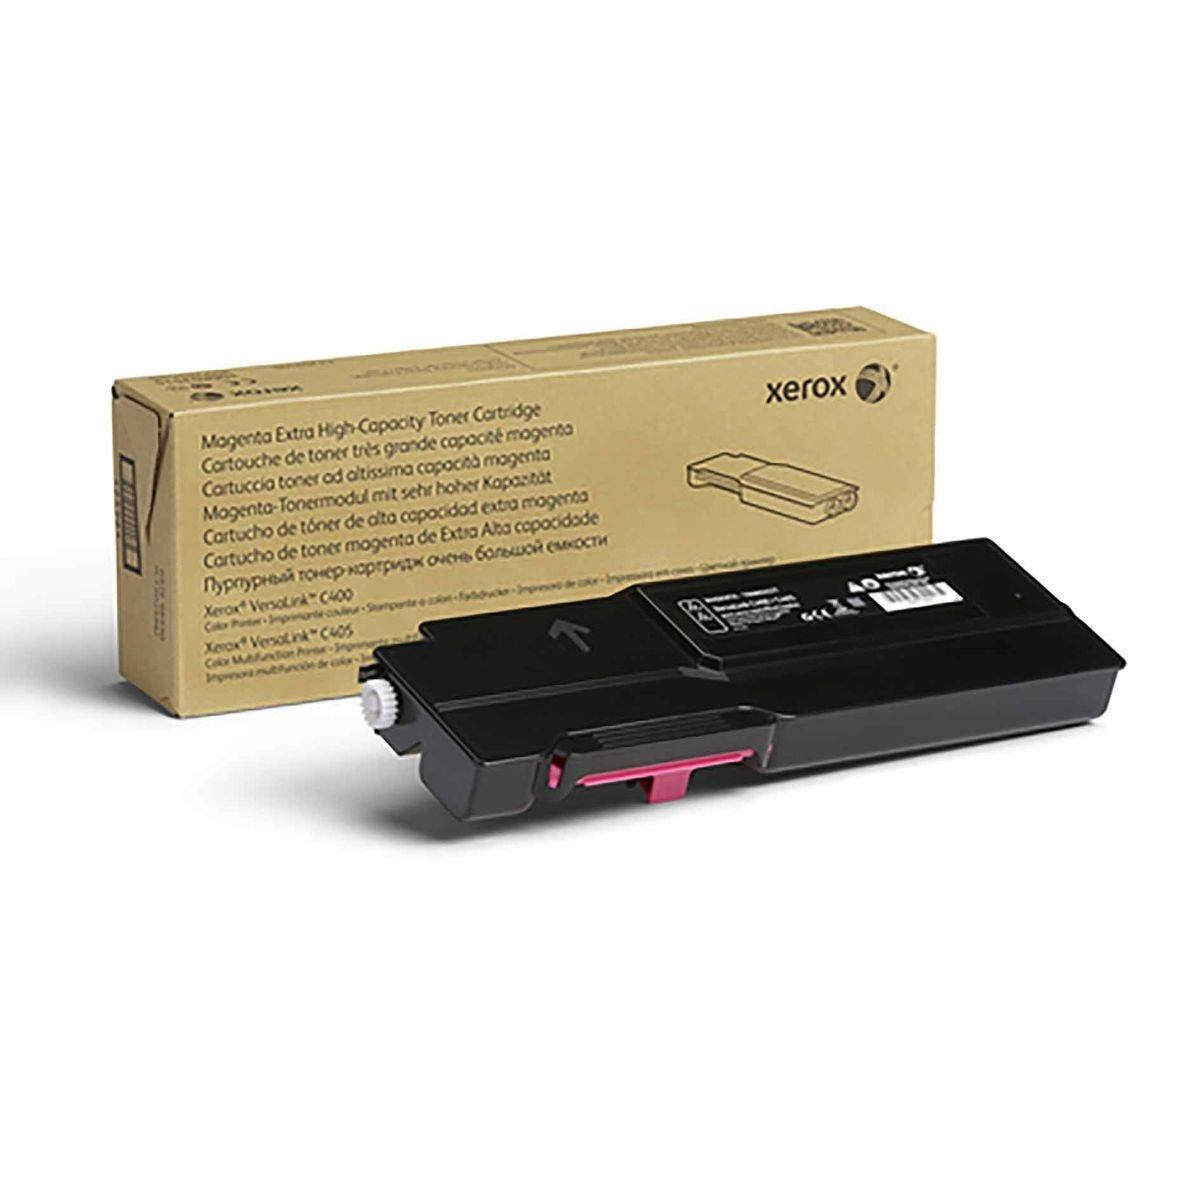 Xerox VersaLink C400-C405 Extra High Capacity Magenta Original Toner Cartridge